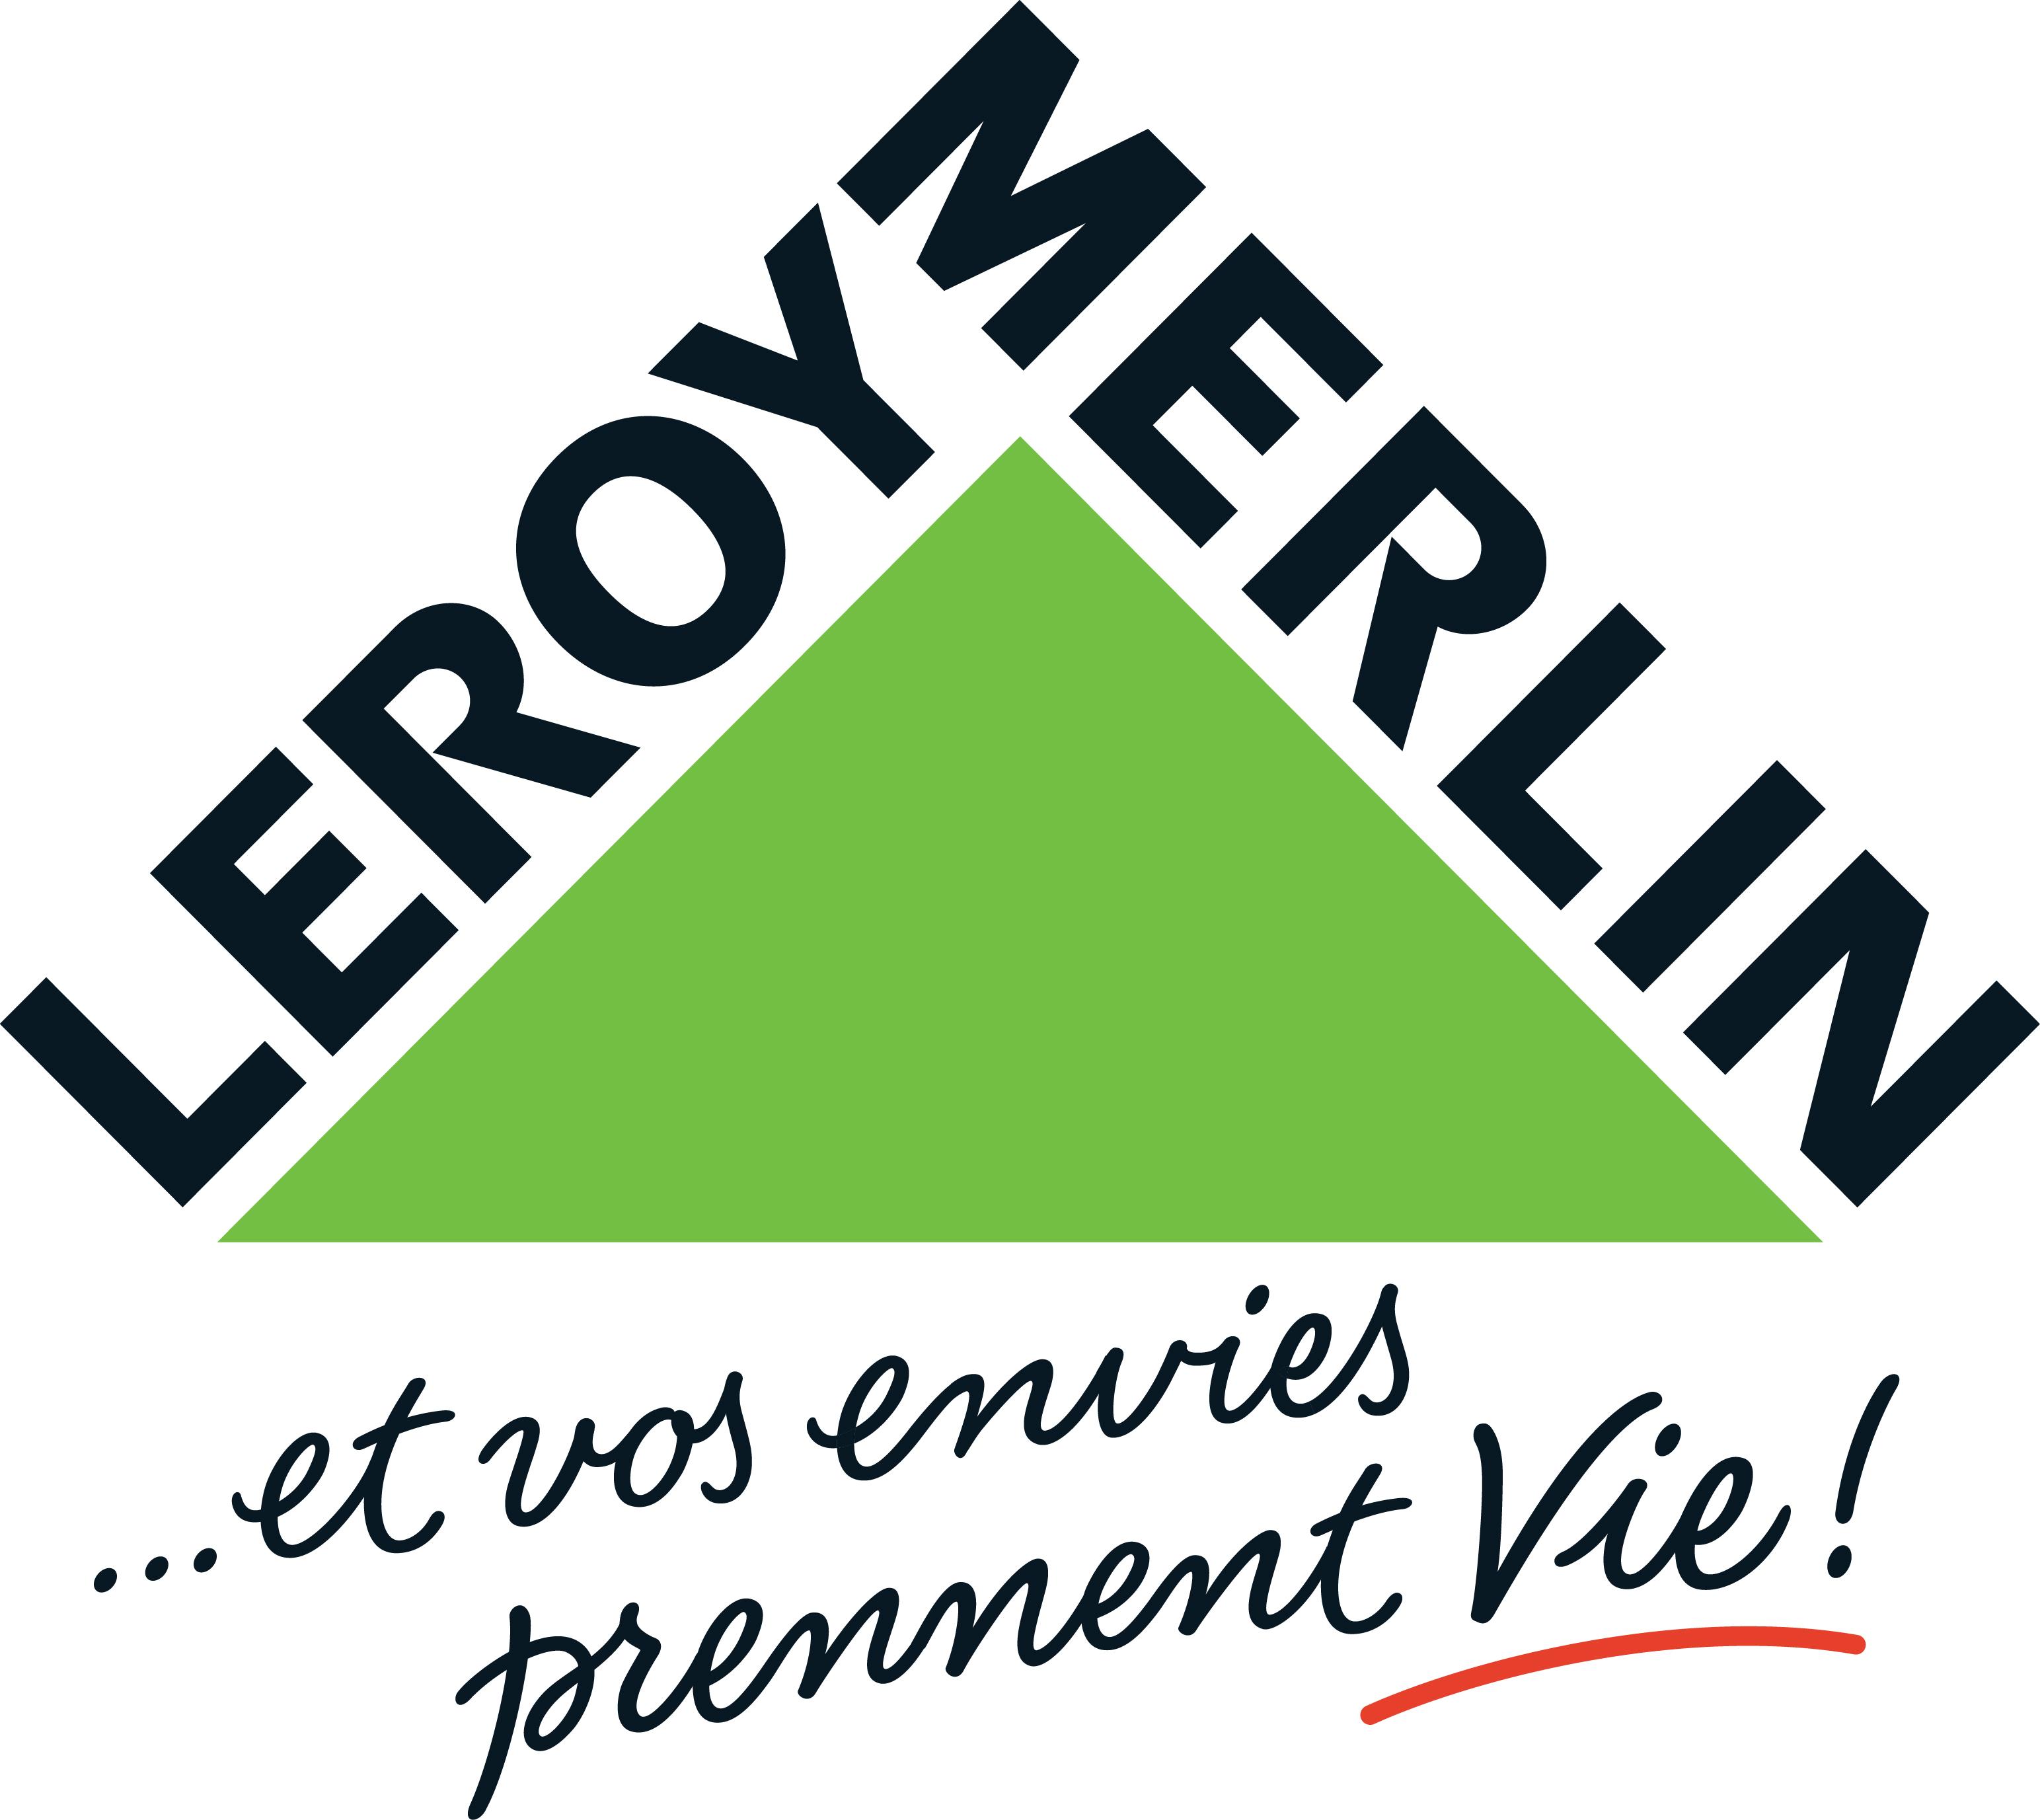 Le Roy Logo photo - 1